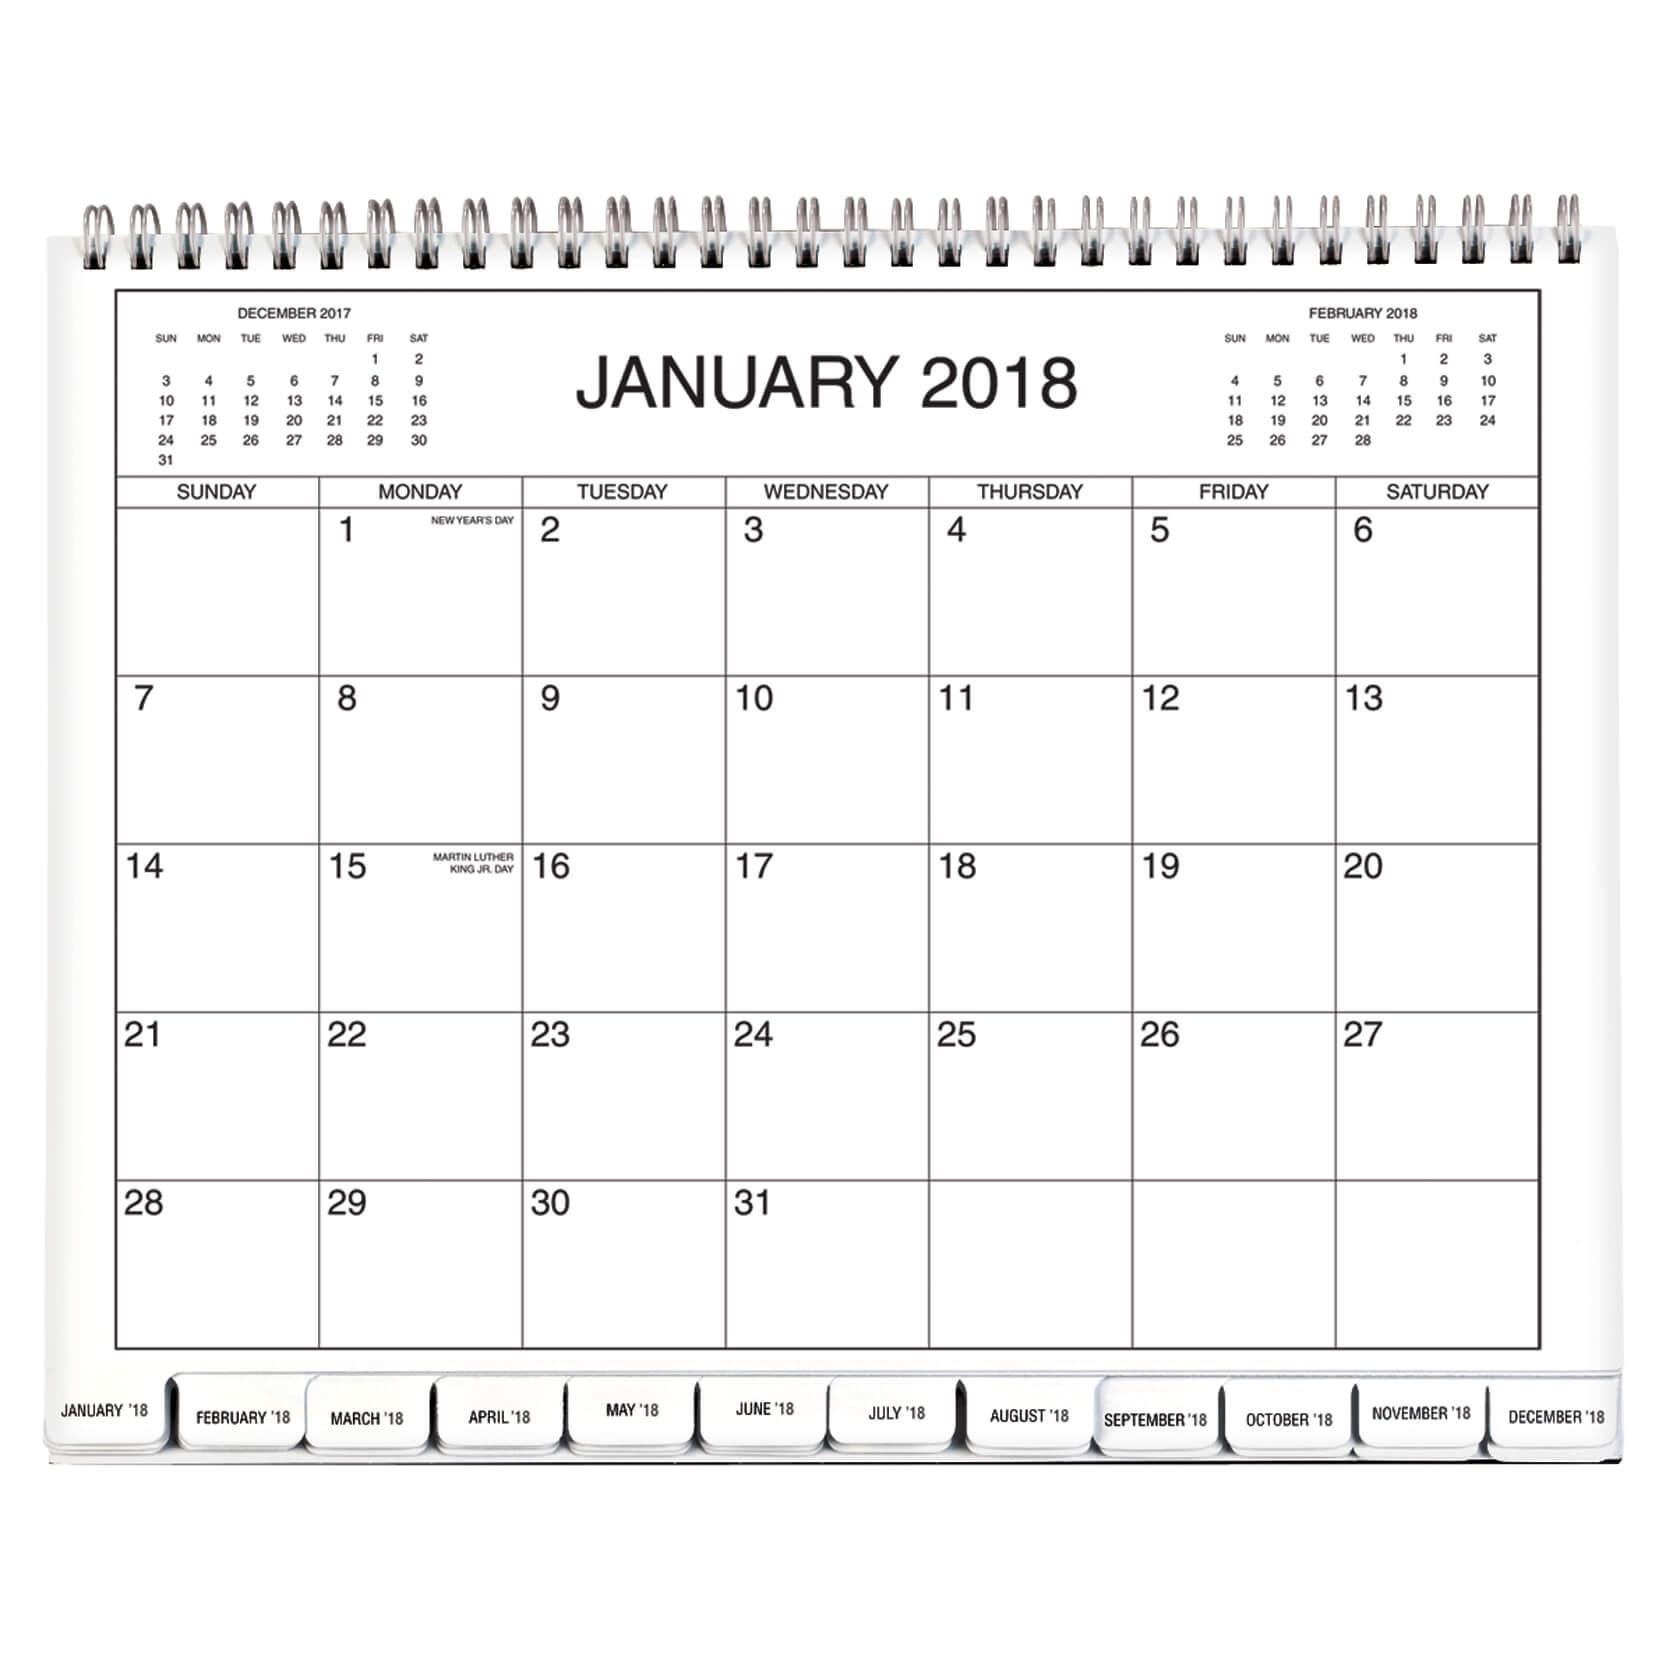 5 Year Calendar 2018-2019-2020-2021-2022 3 Year Calendar Reference Printable 2020-2022